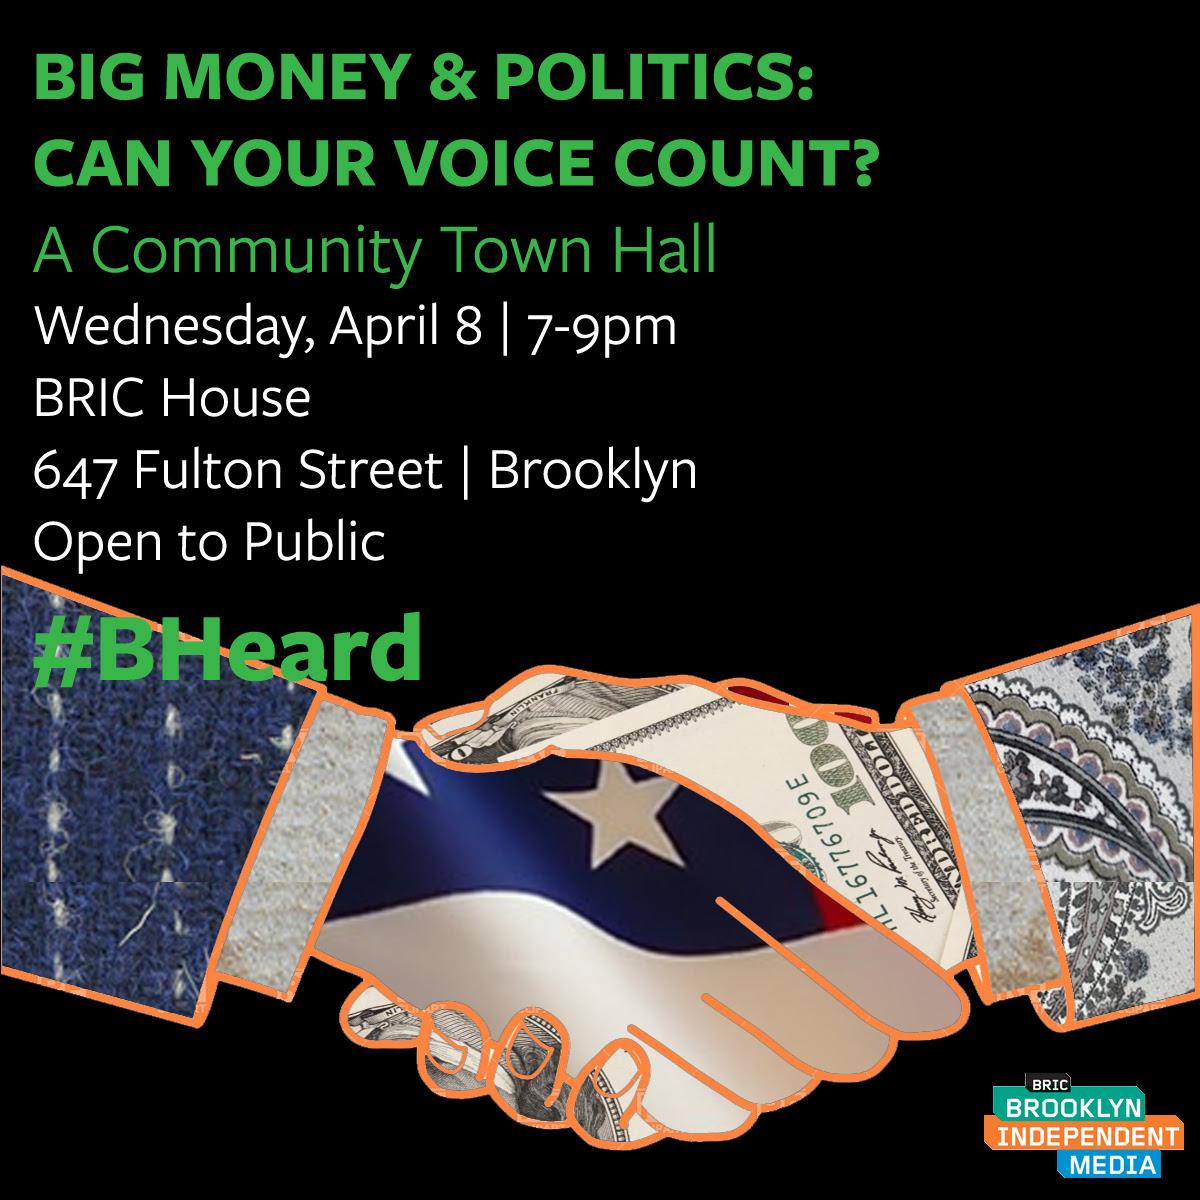 Big_Money_and_Politics.jpg